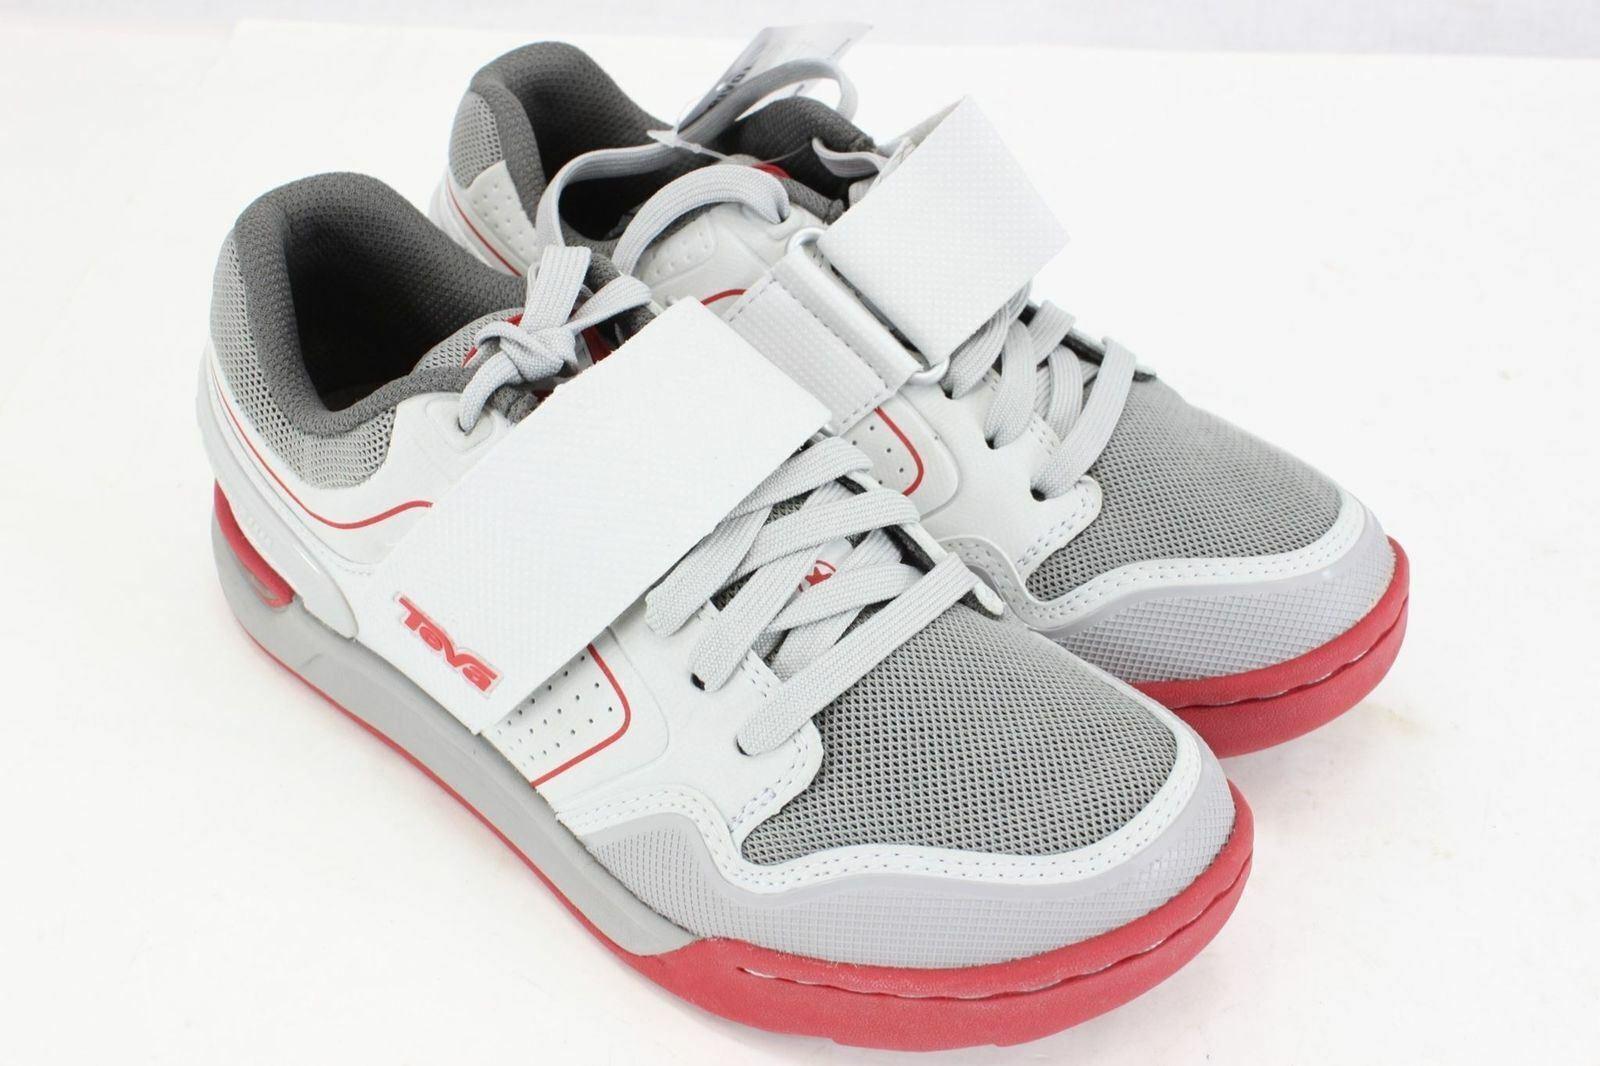 Teva Men's Pivot Cycling shoes Light Grey Size 5 1002980 NOS